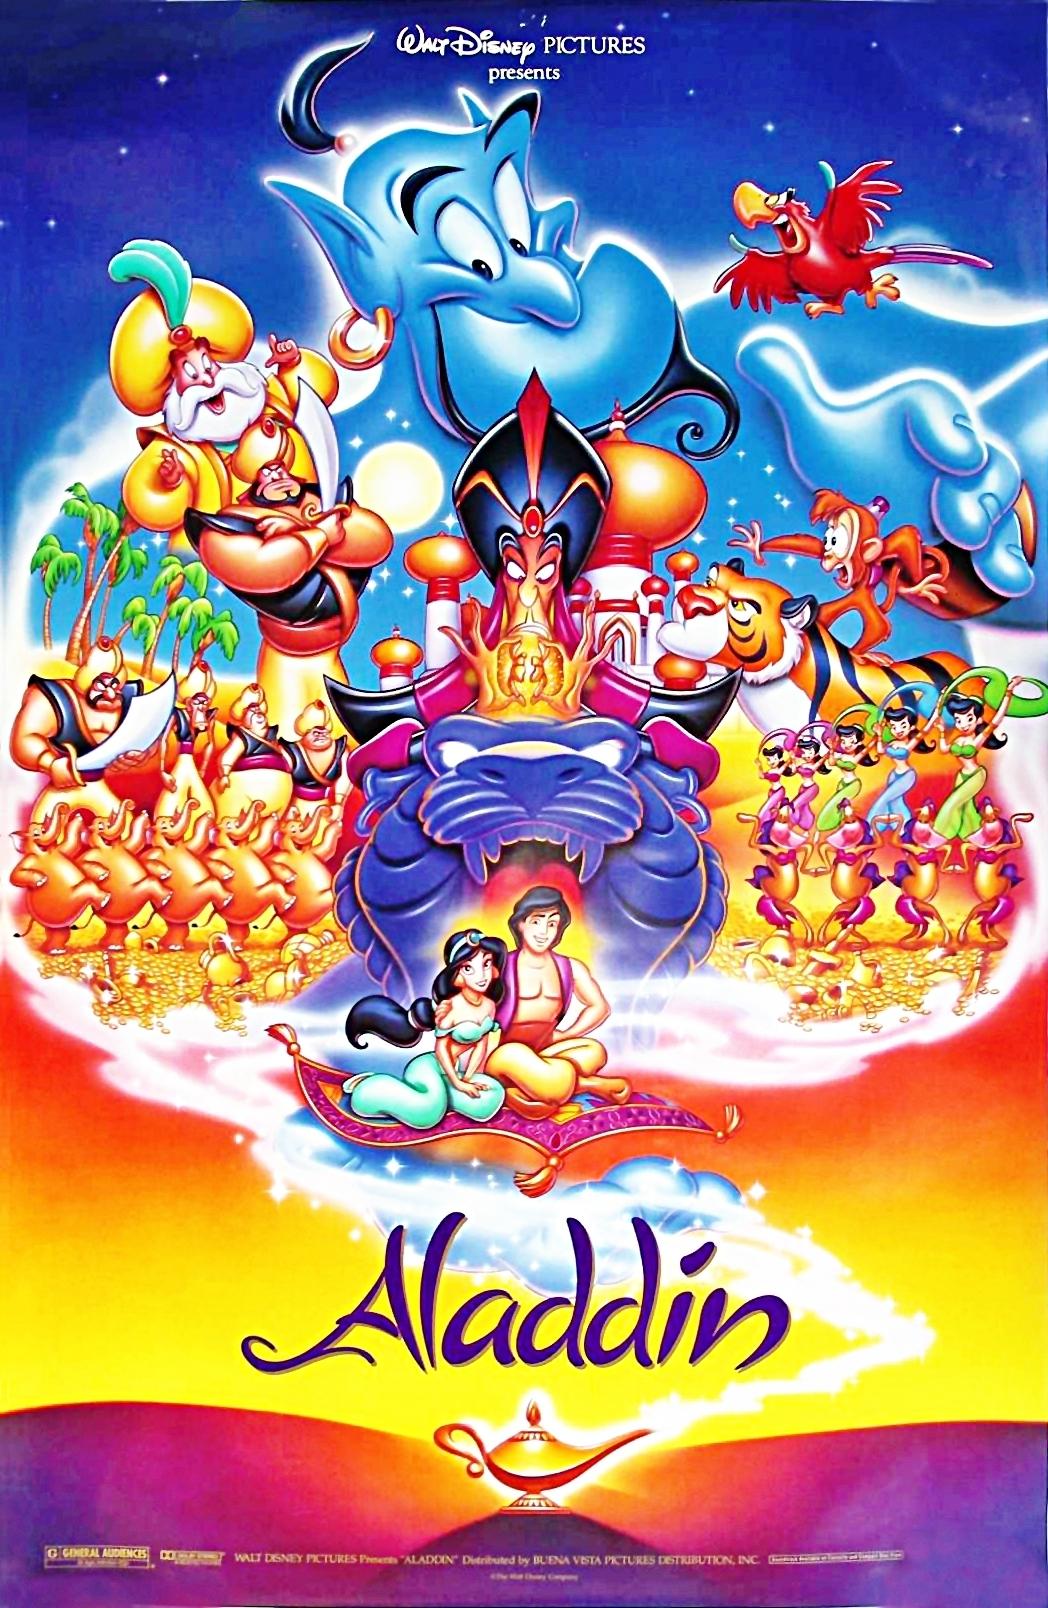 aladdin_1992_poster.jpg